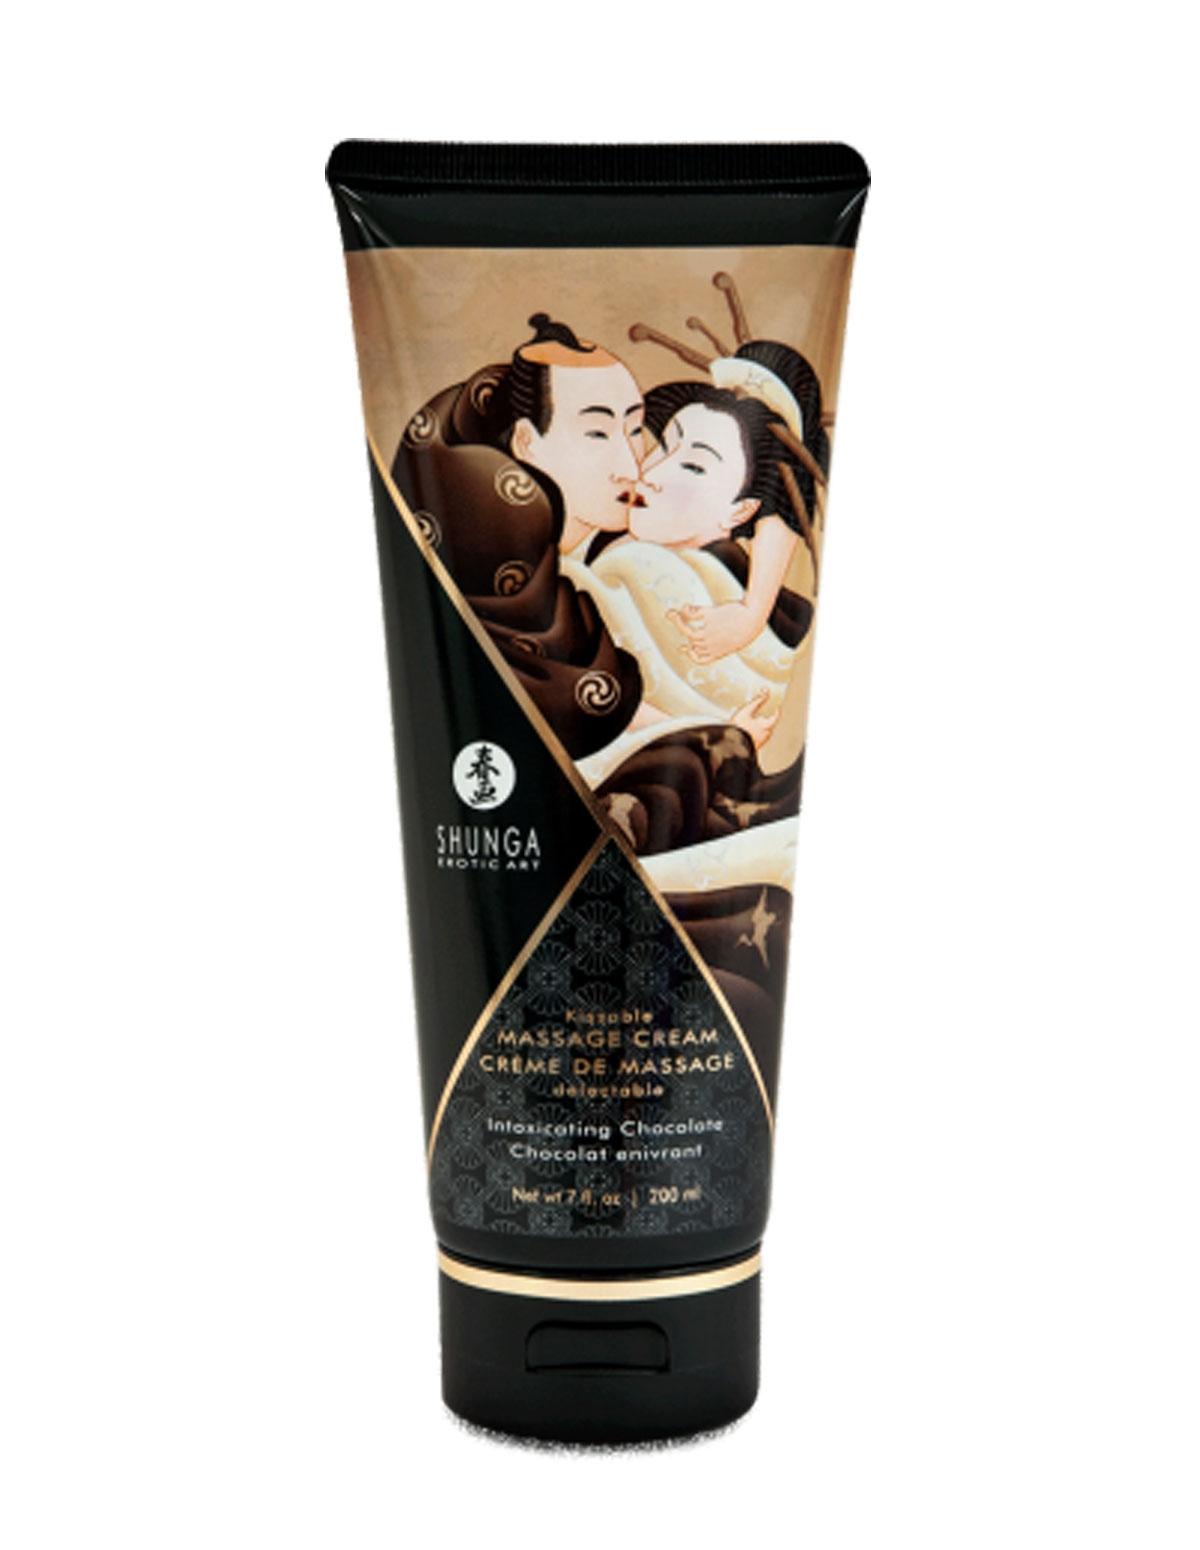 Kissable Massage Cream - Intoxicating Chocolate